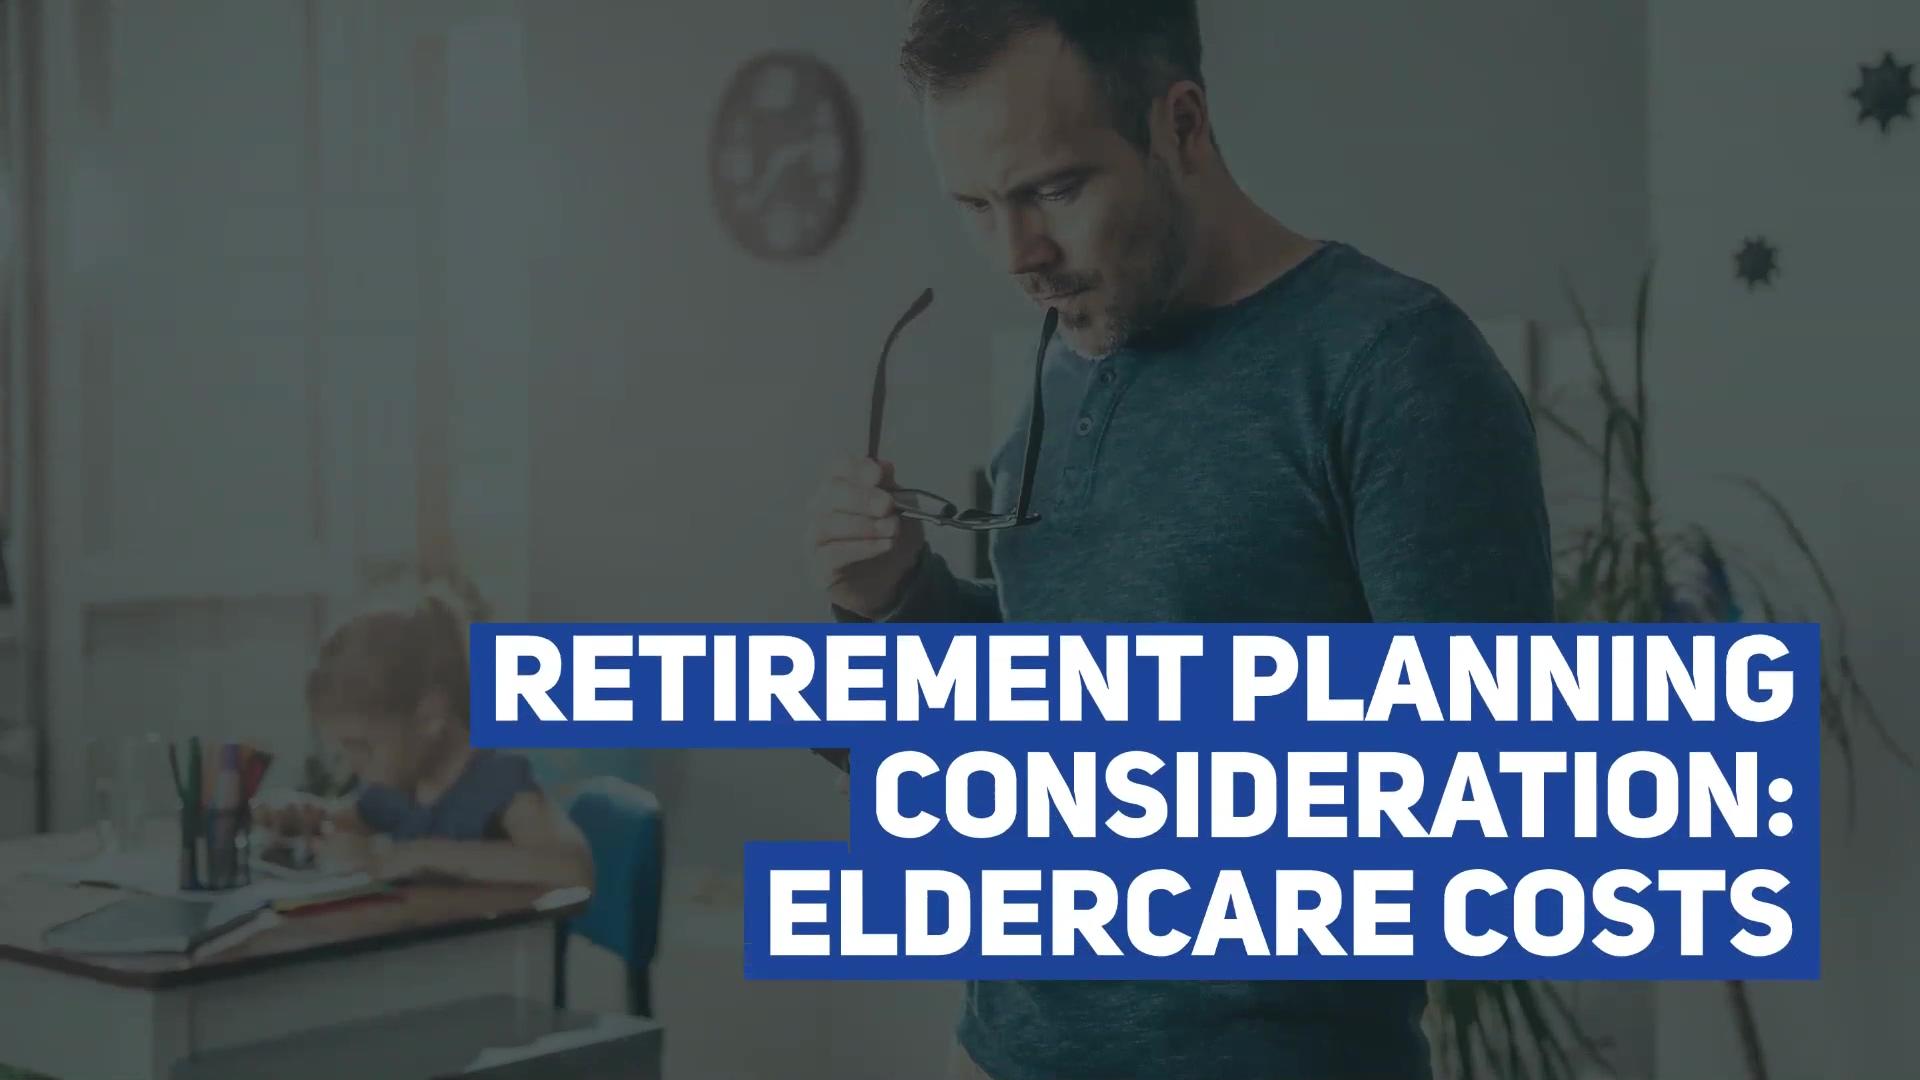 Retirement_Planning_Consideration_Elderc (3)